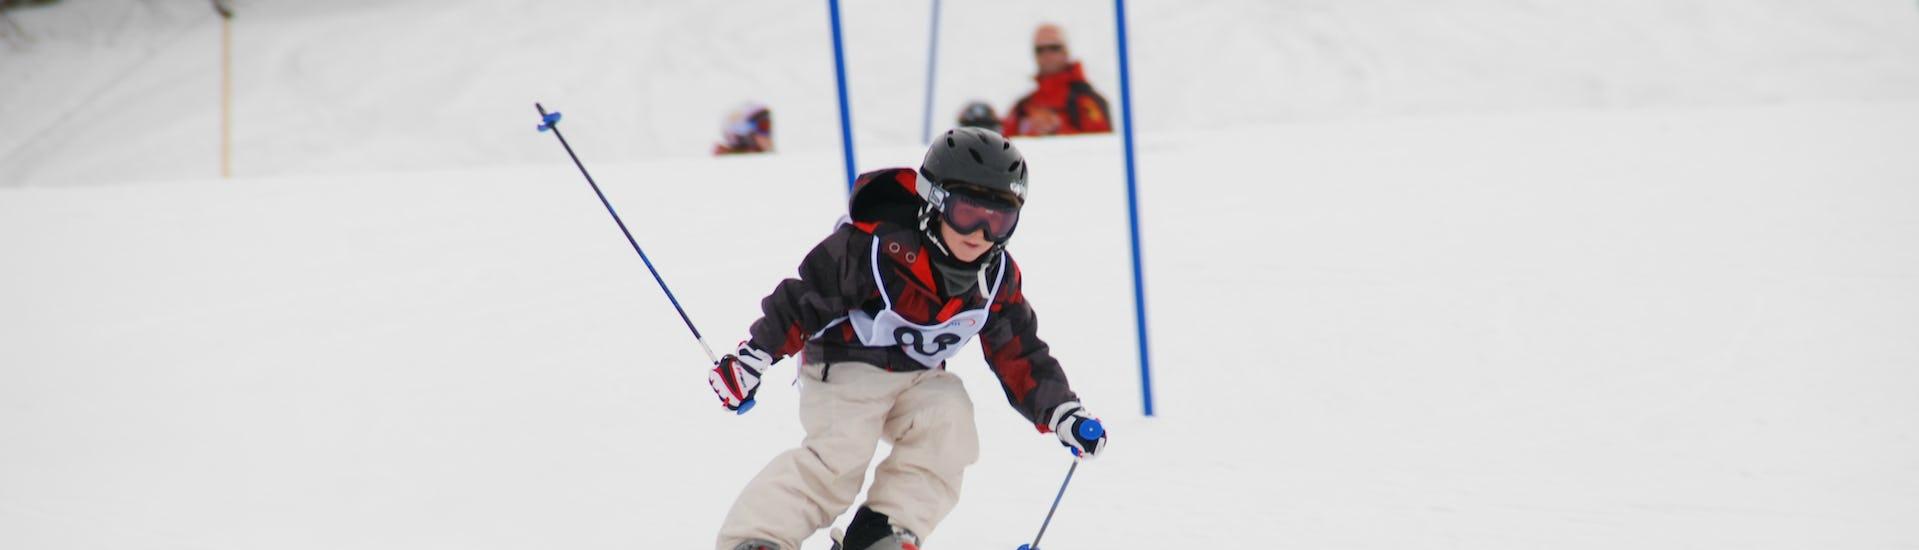 "Ski Lessons ""Kids Club"" (4-15 years) - Advanced"